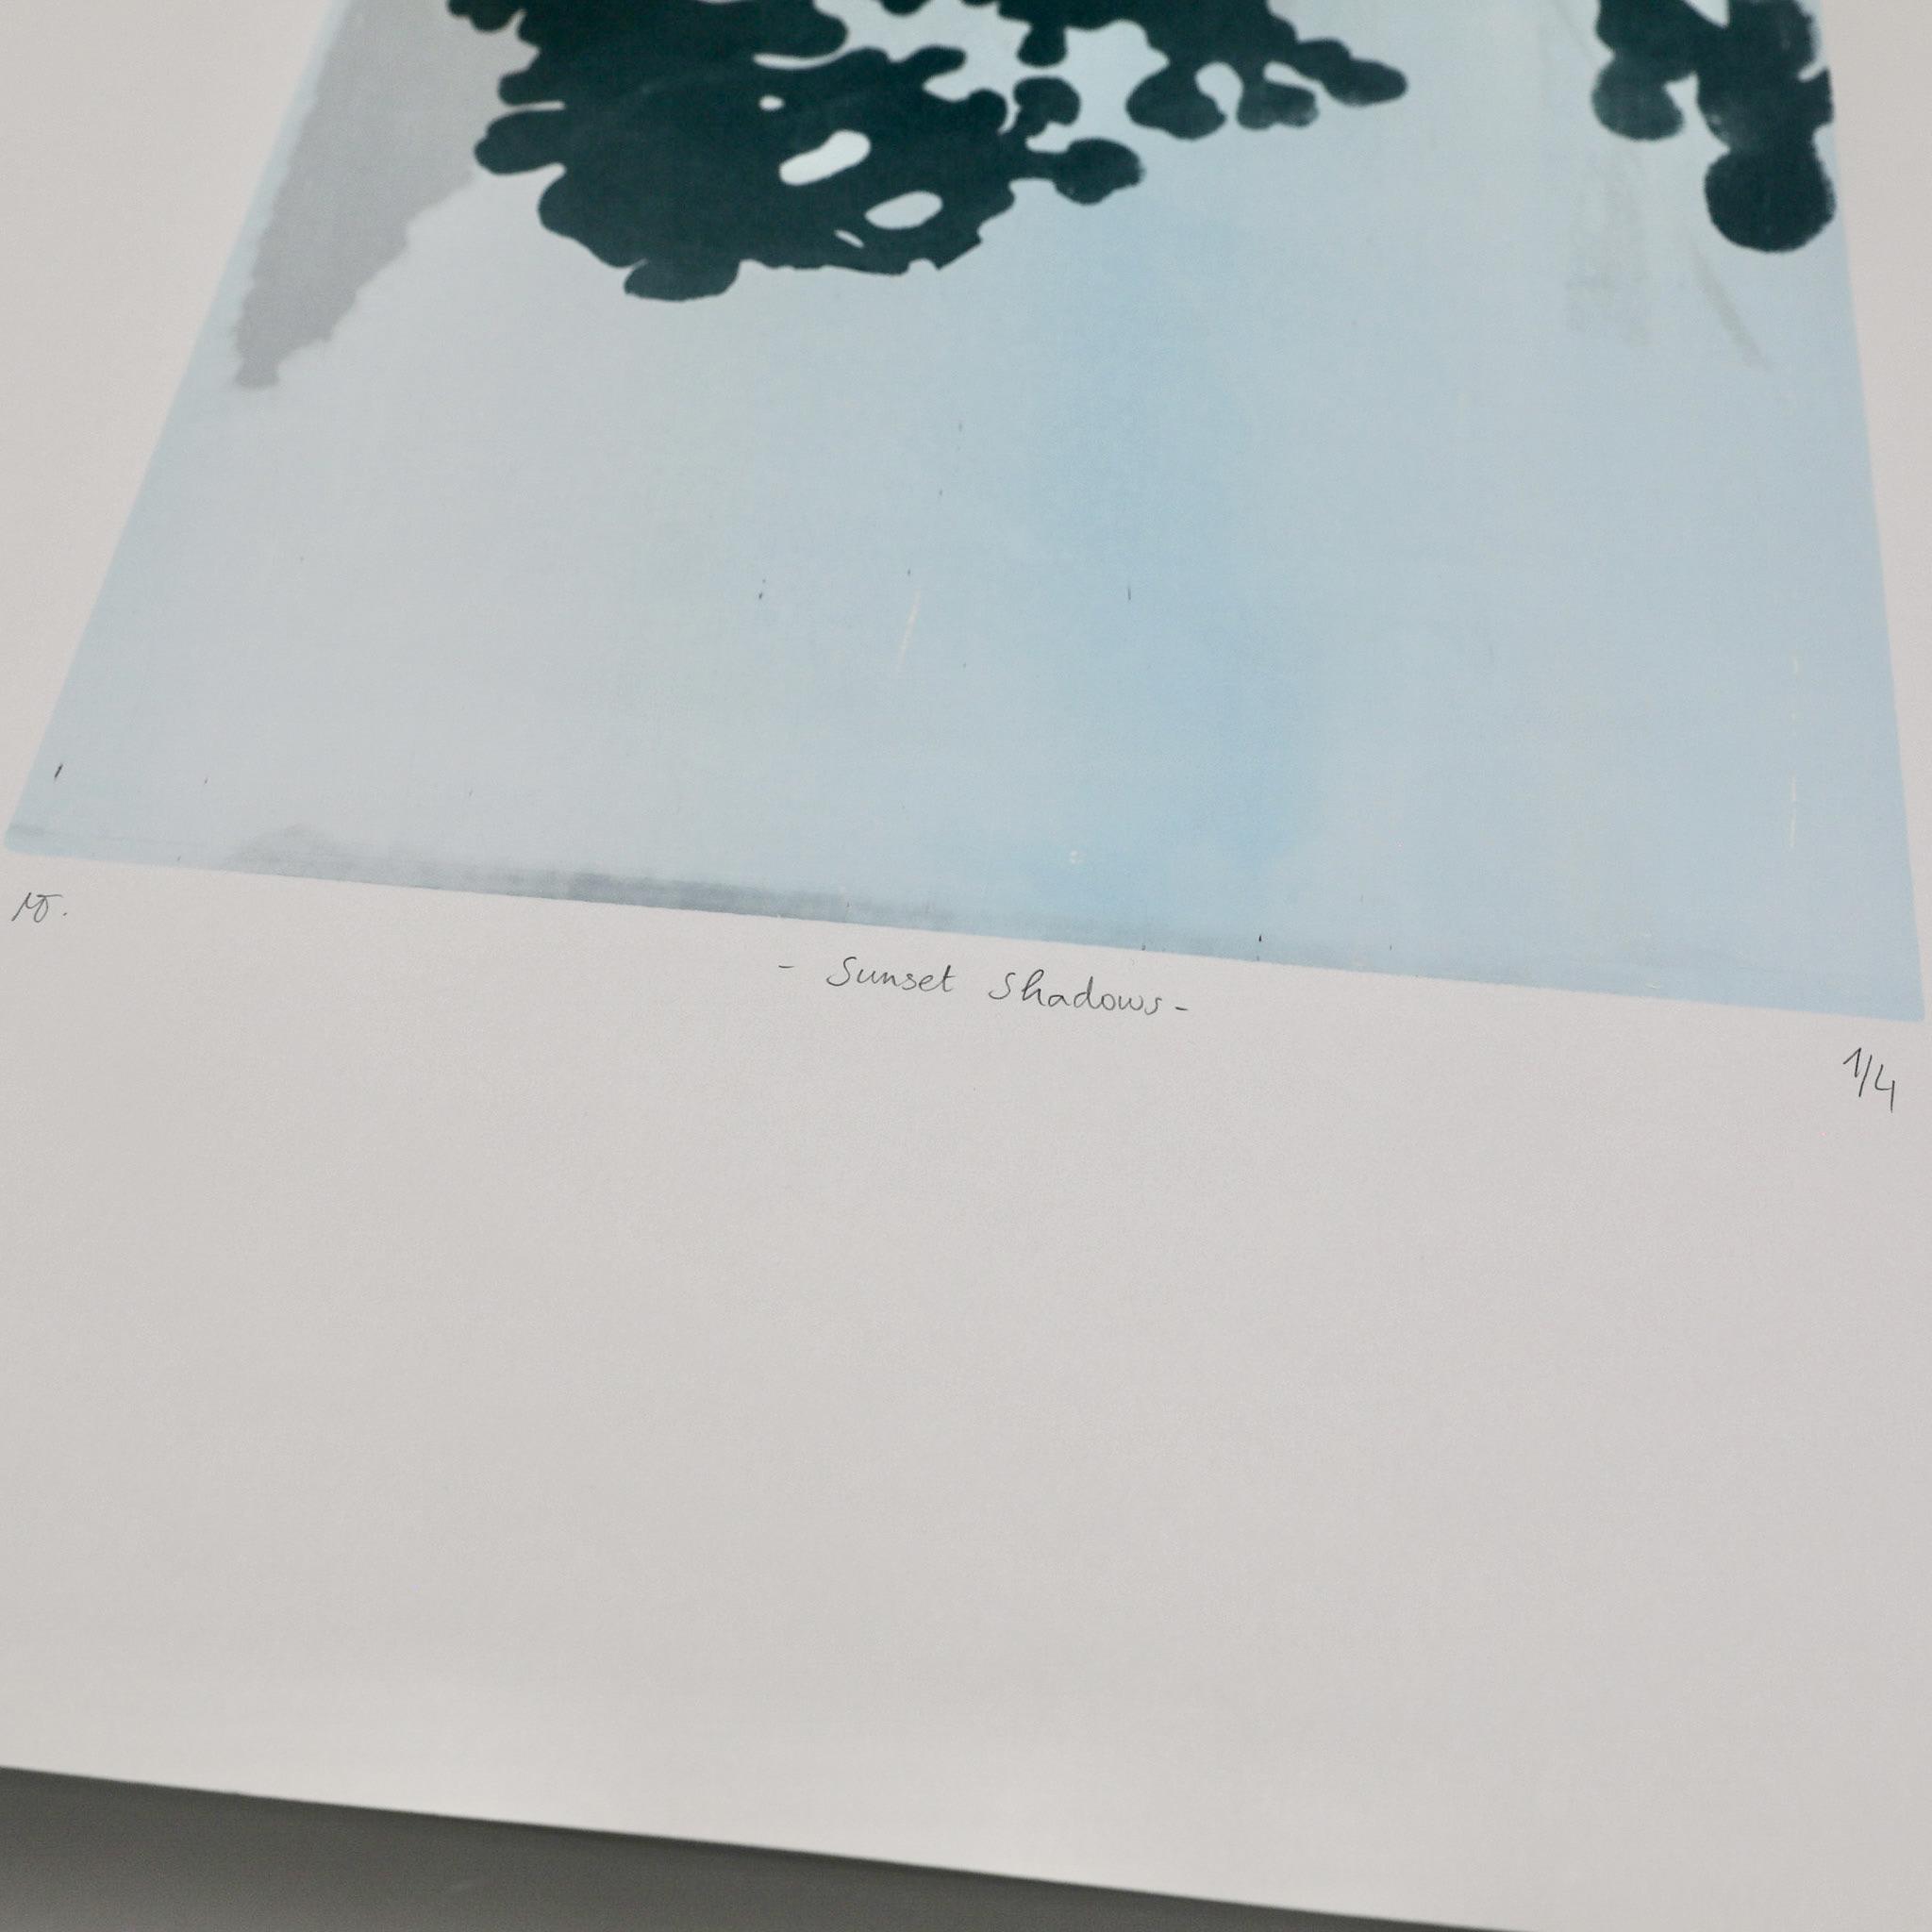 IMG 0428 1 - Sunset Shadows by Mathilda della Torre